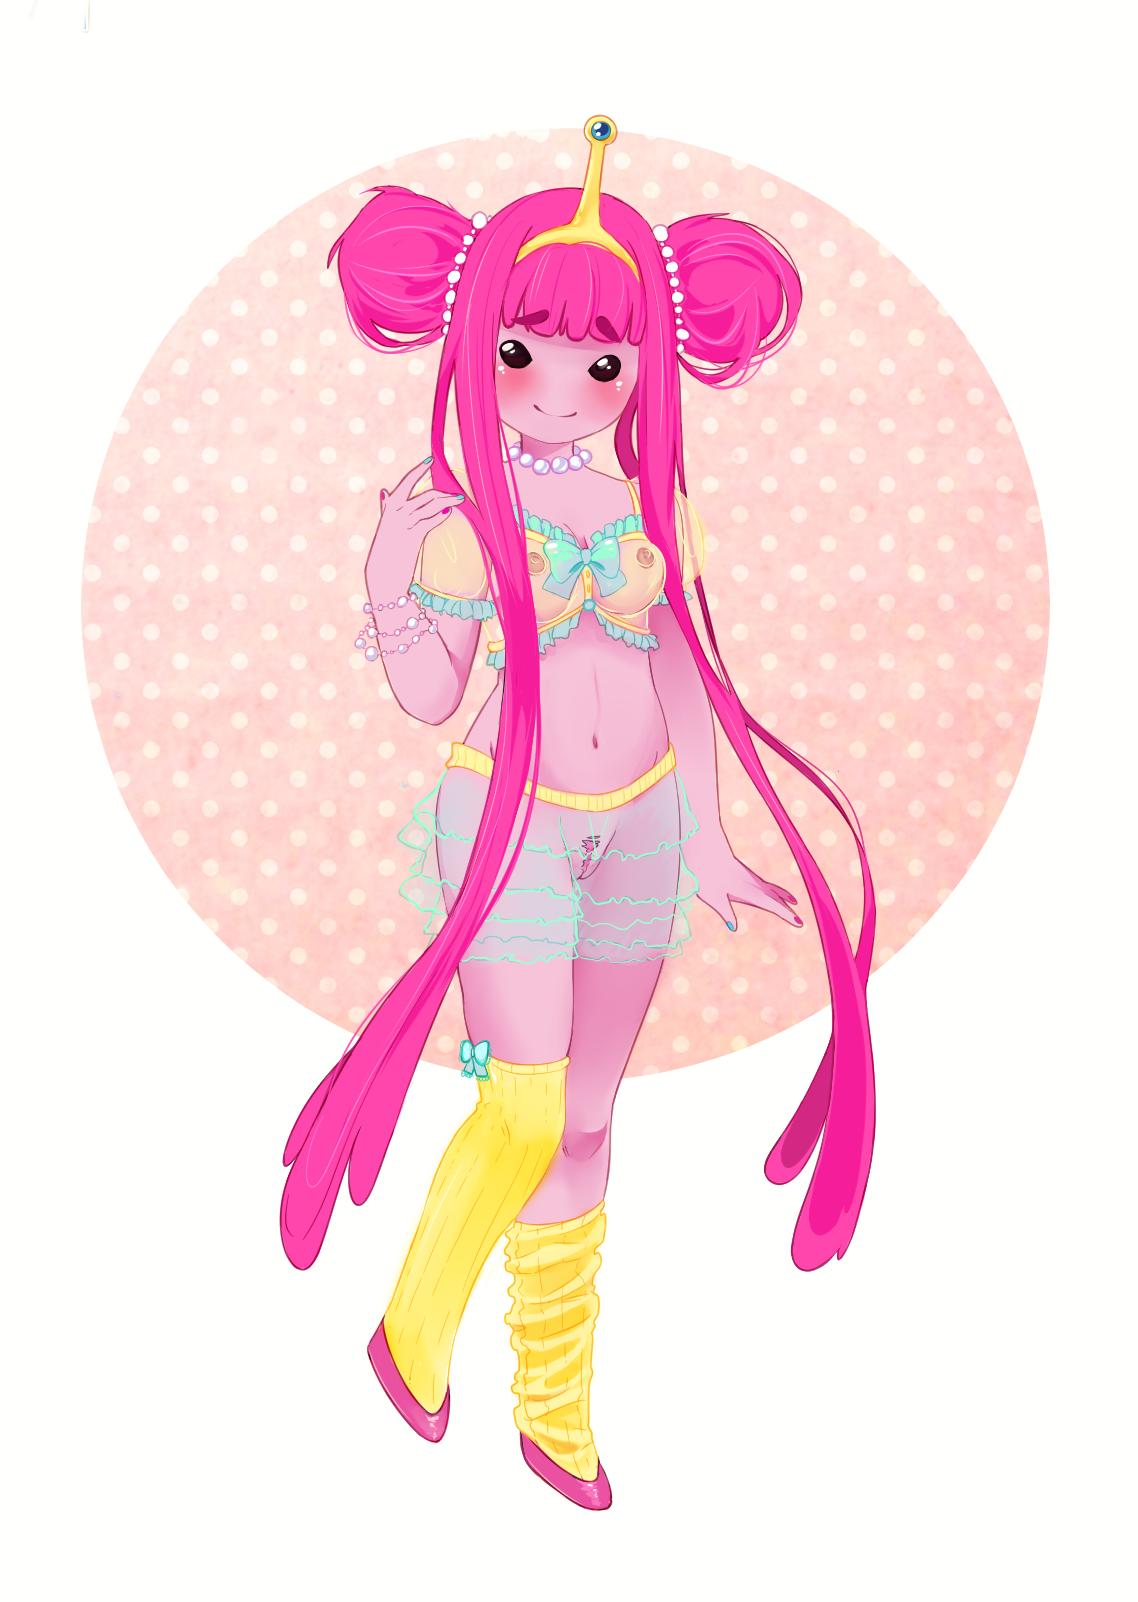 1190957_-_adventure_time_princess_bubblegum (1)